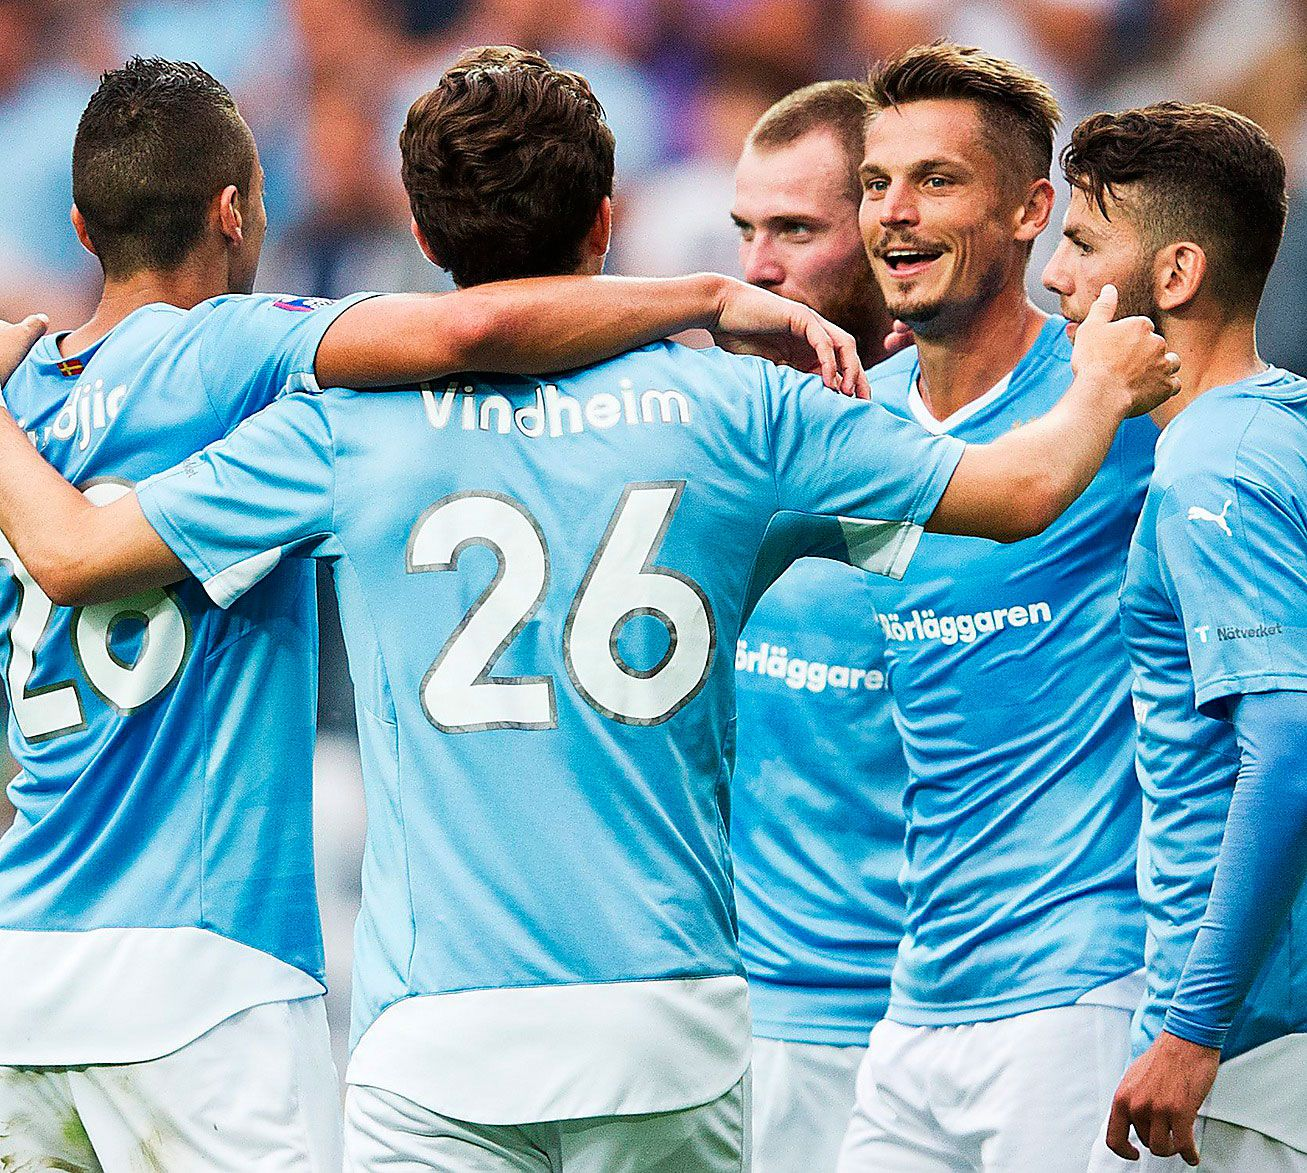 Malmo Vs Psg Winners And Losers From Champions League: Flyttar Allsvenska Matcher Efter CL-schema